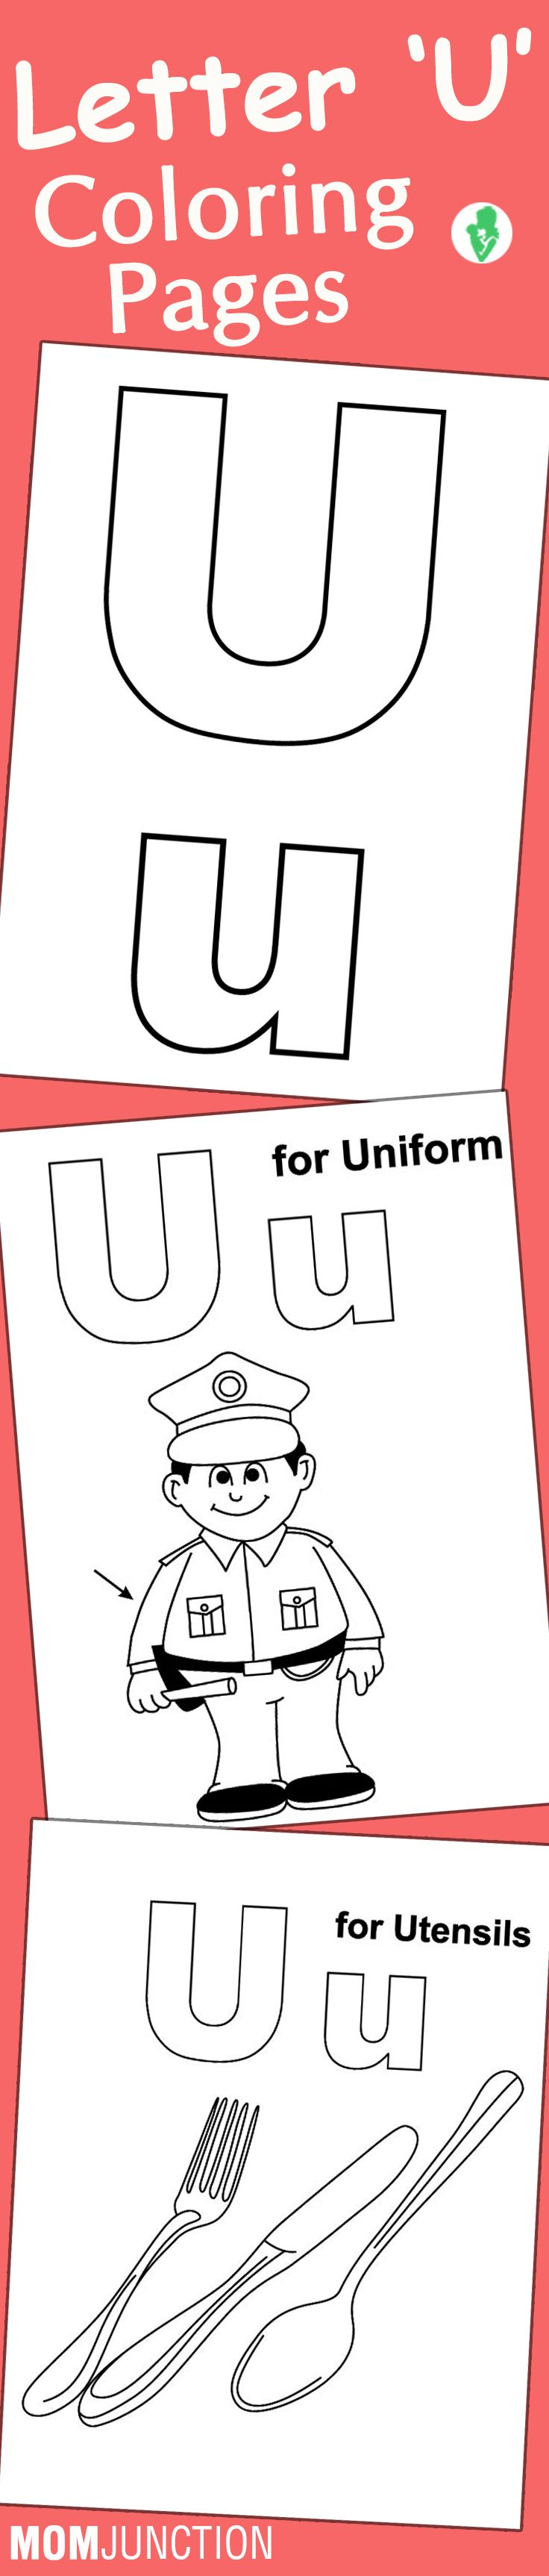 Letter U Coloring Pages Free Printables Letter u